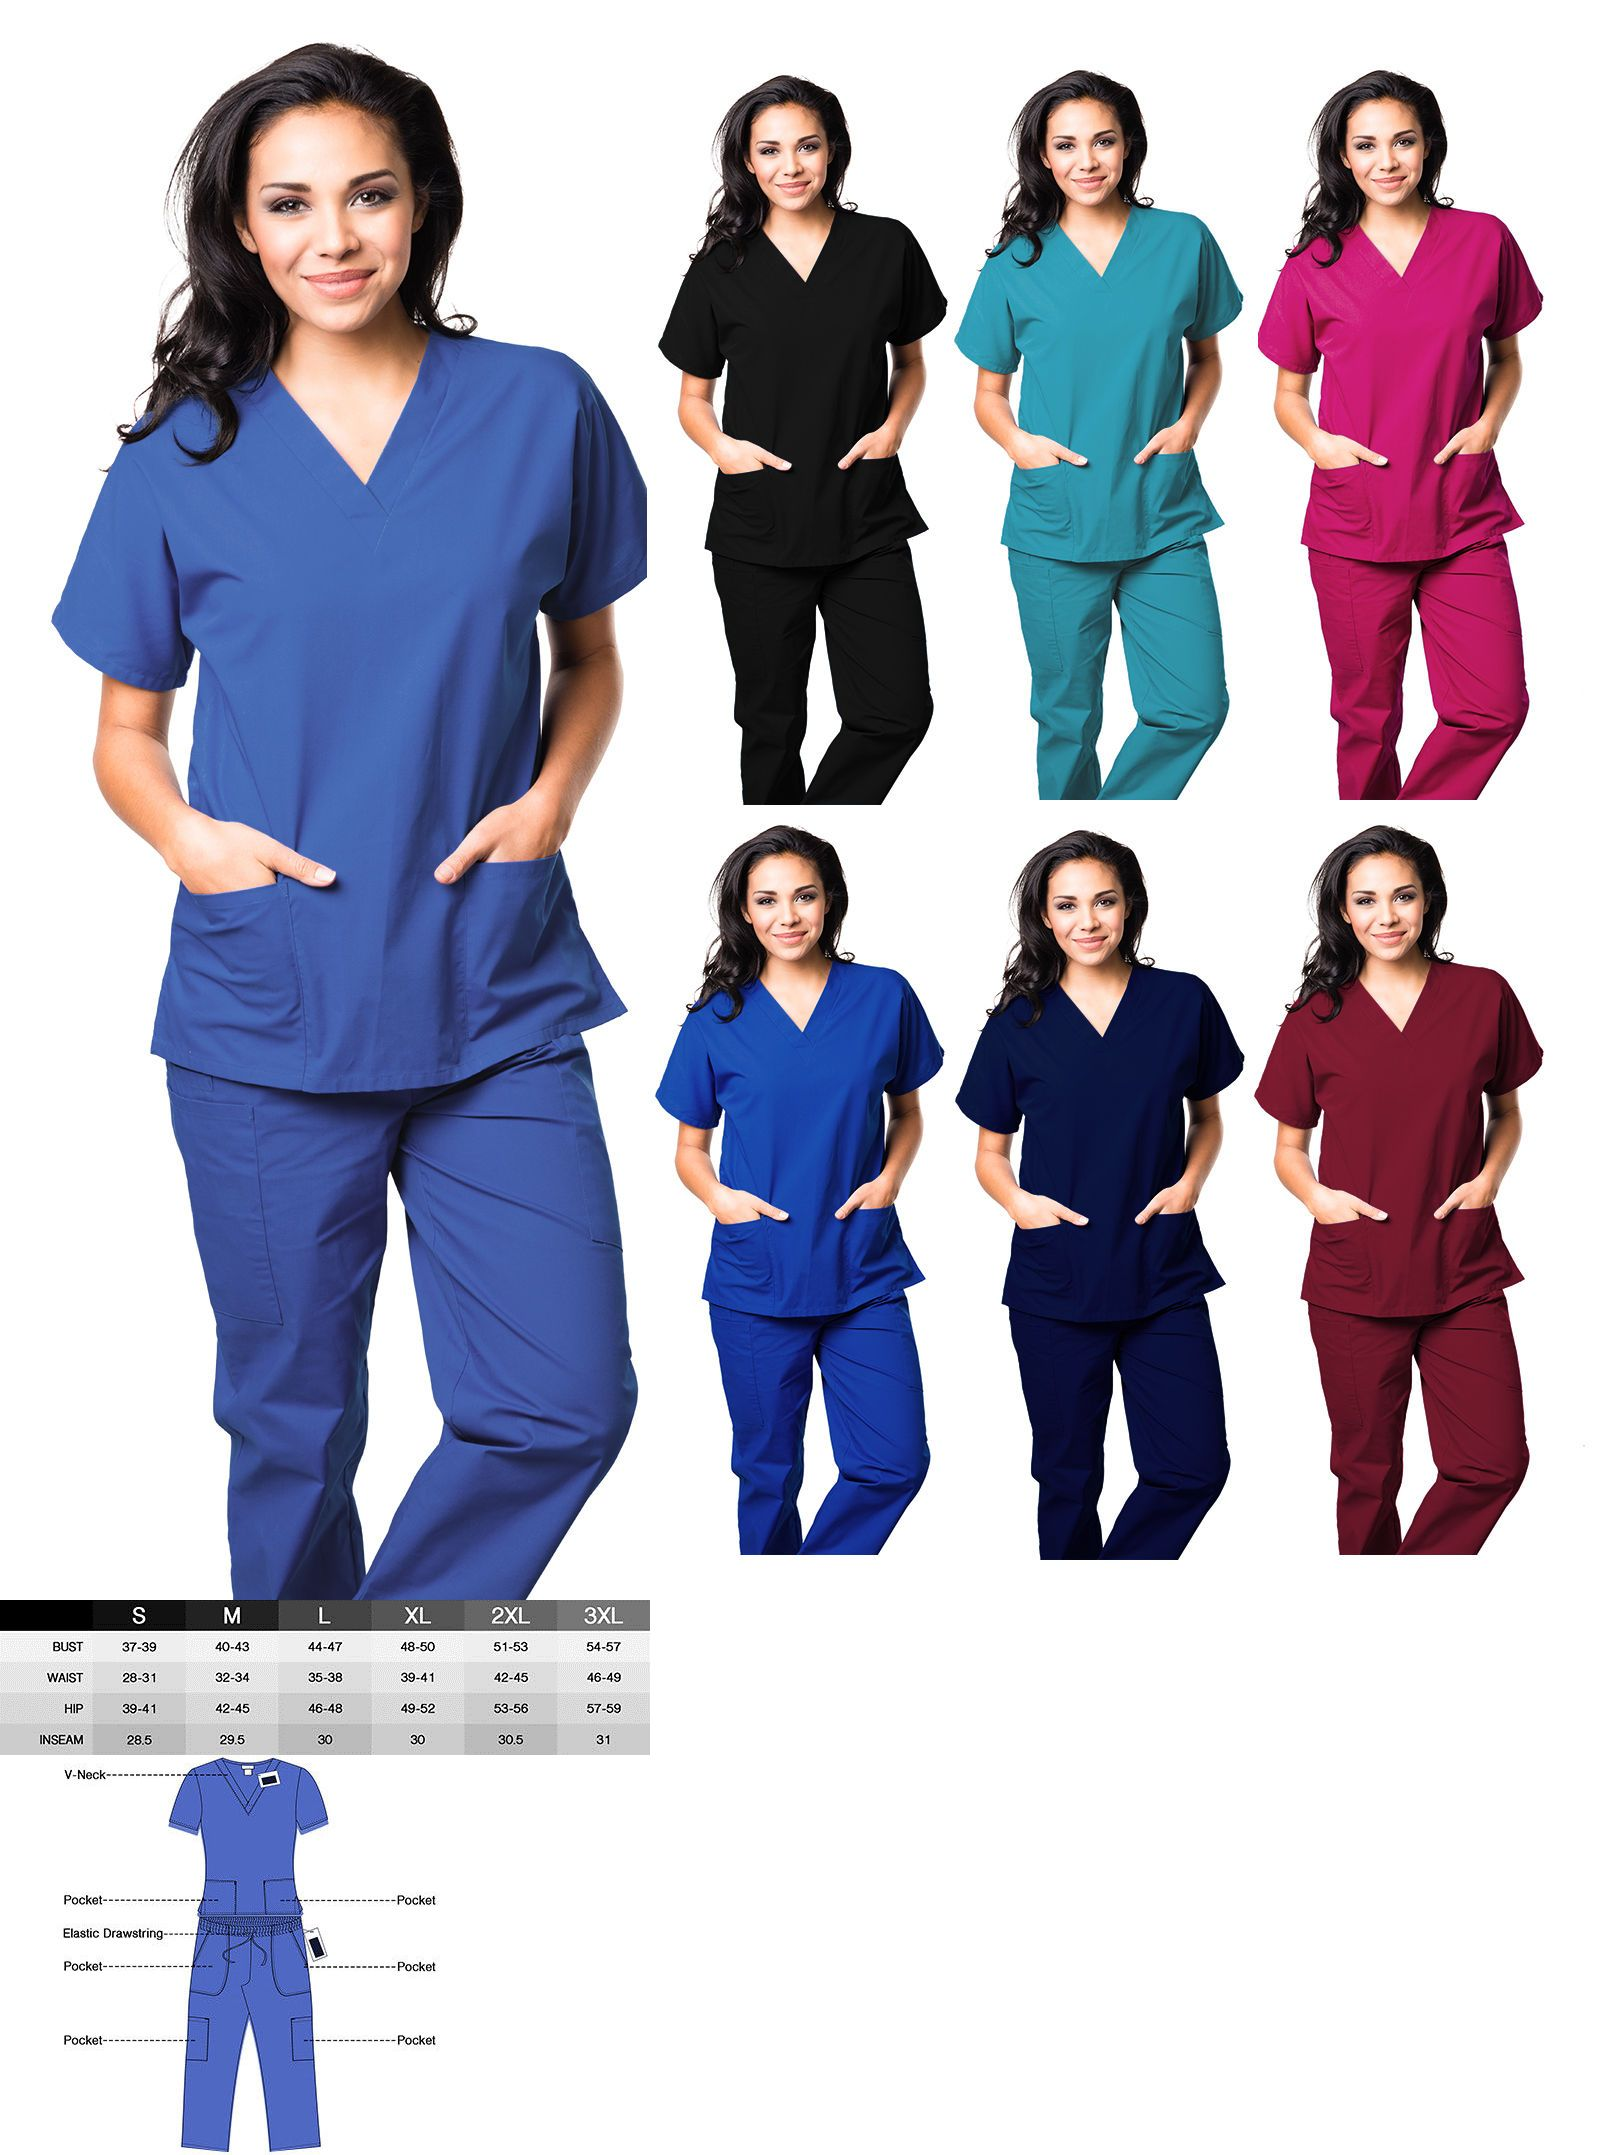 cffbe04b4c2 Sets 105432: Unisex Men Women Medical Uniform Hospital Scrubs Set Nursing  Natural Top And Pants